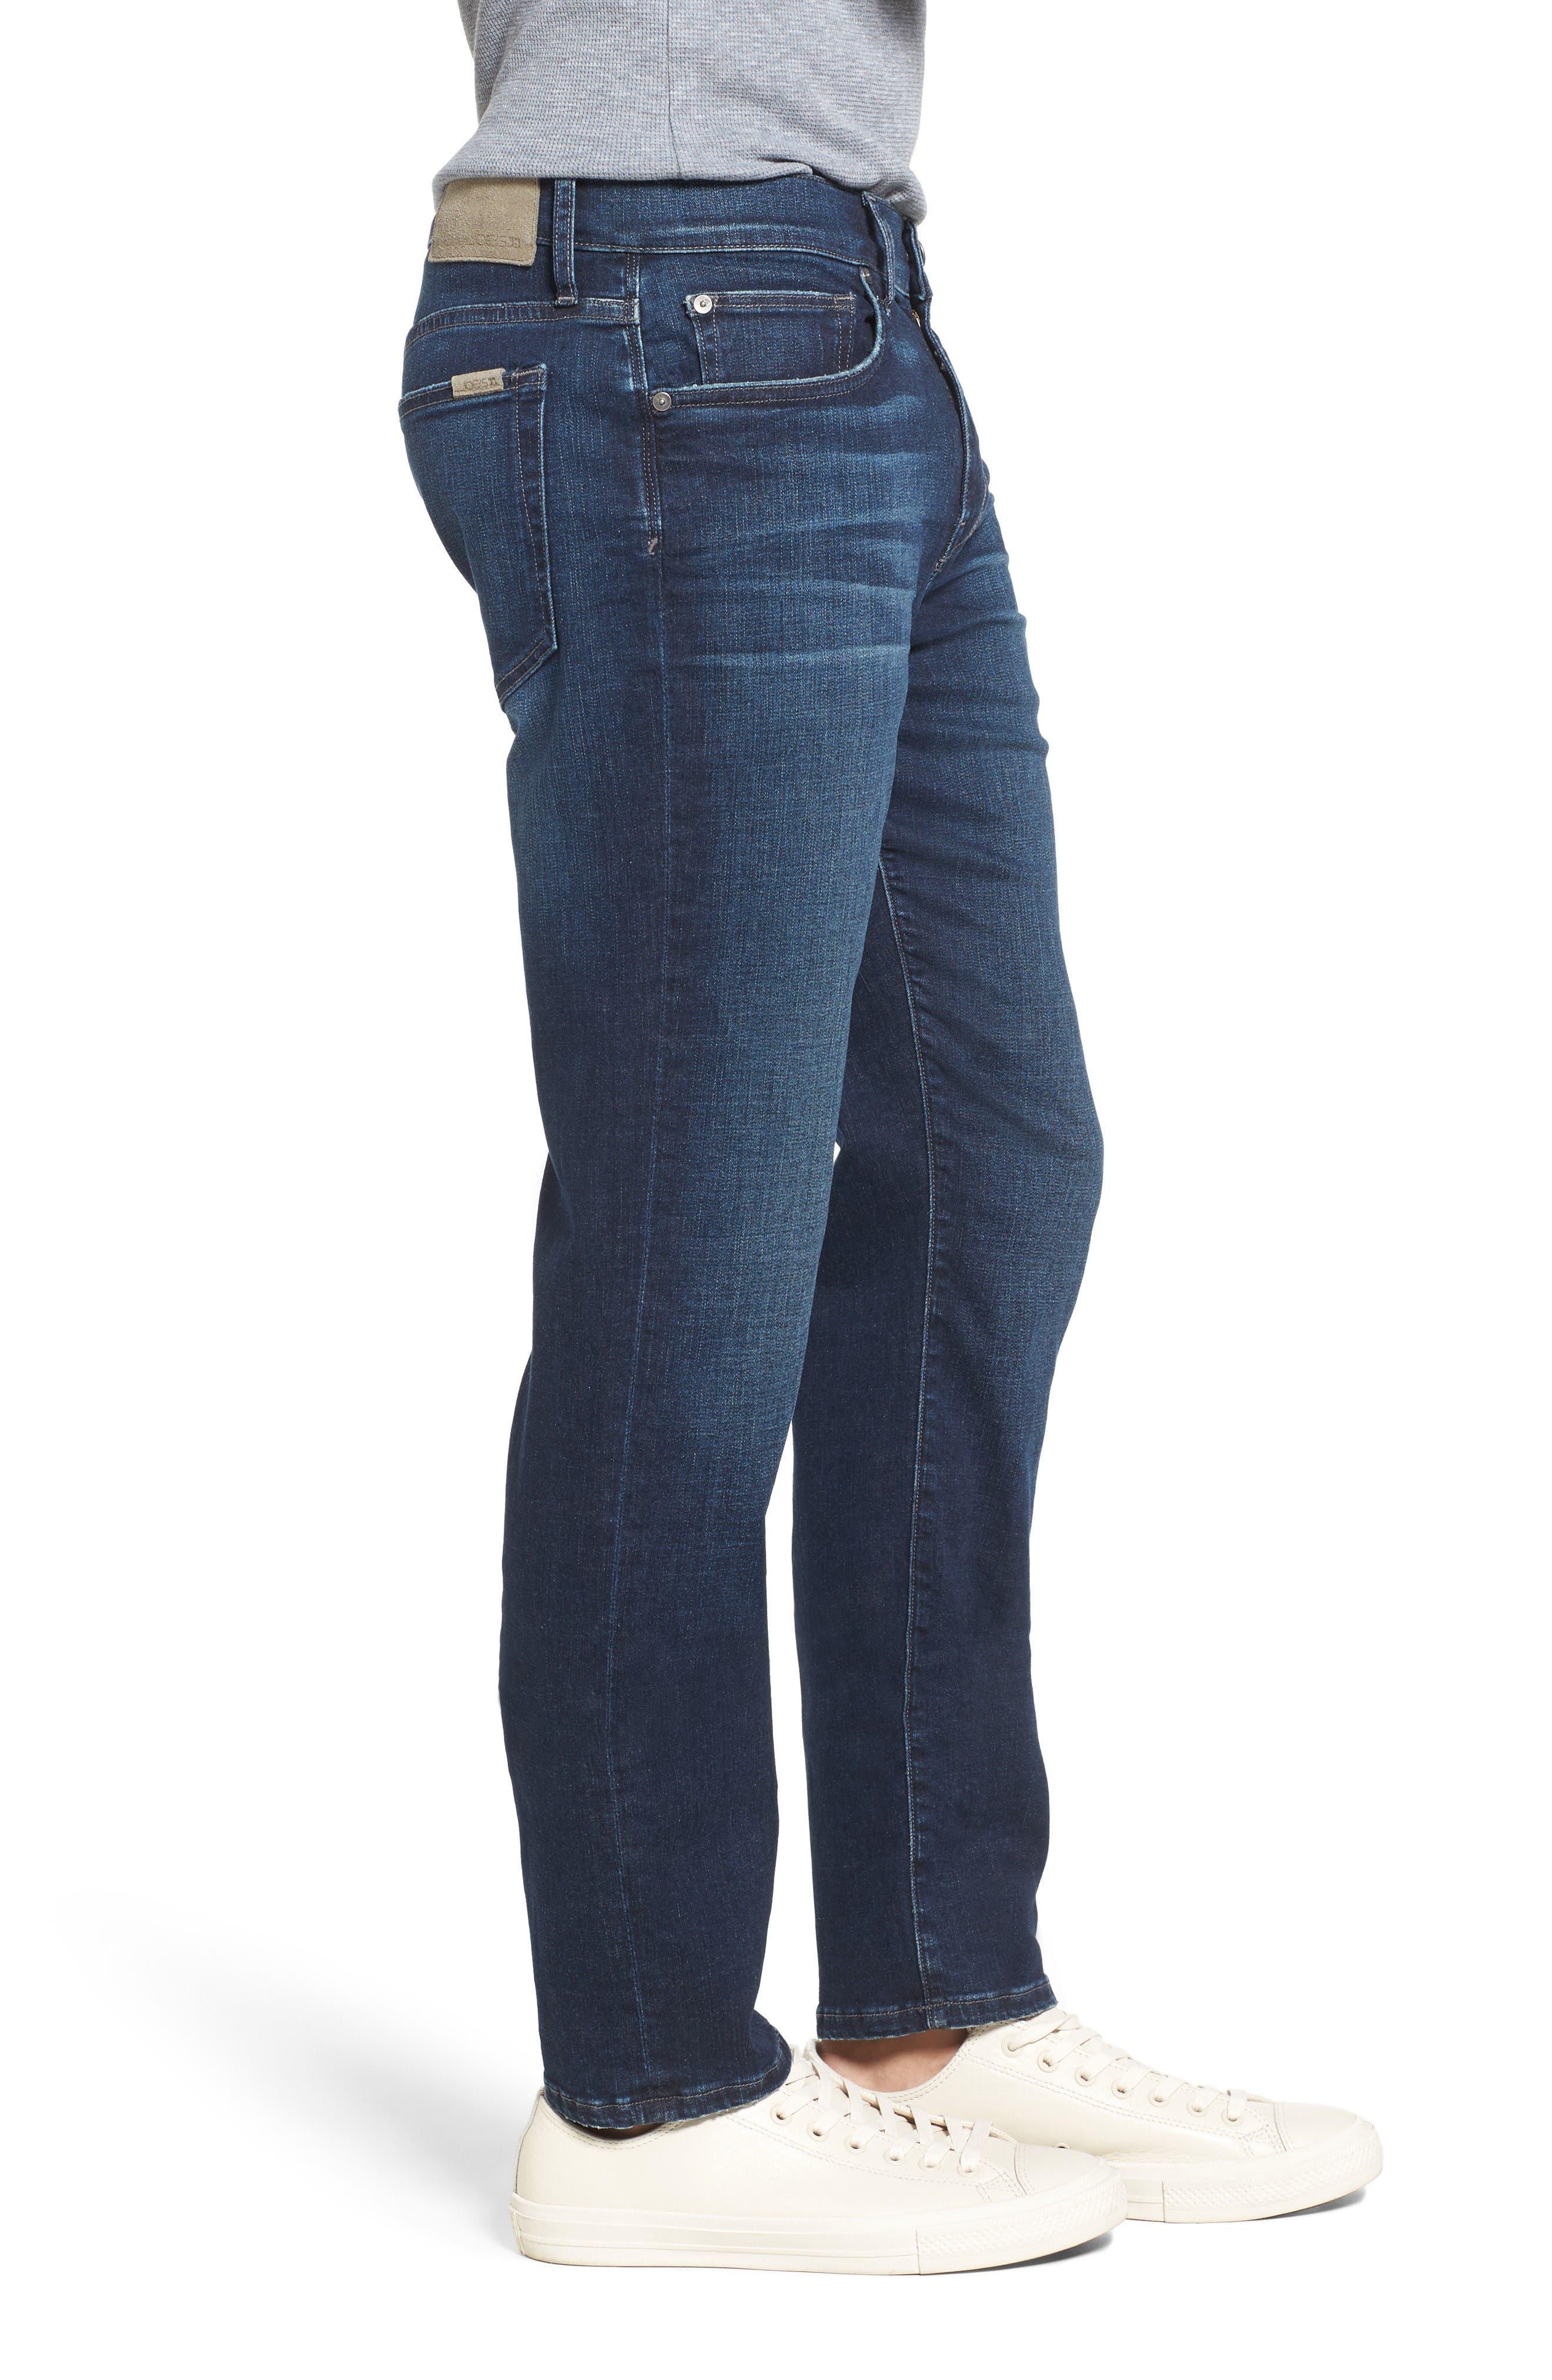 Kinetic Slim Fit Jeans,                             Alternate thumbnail 3, color,                             Aedan